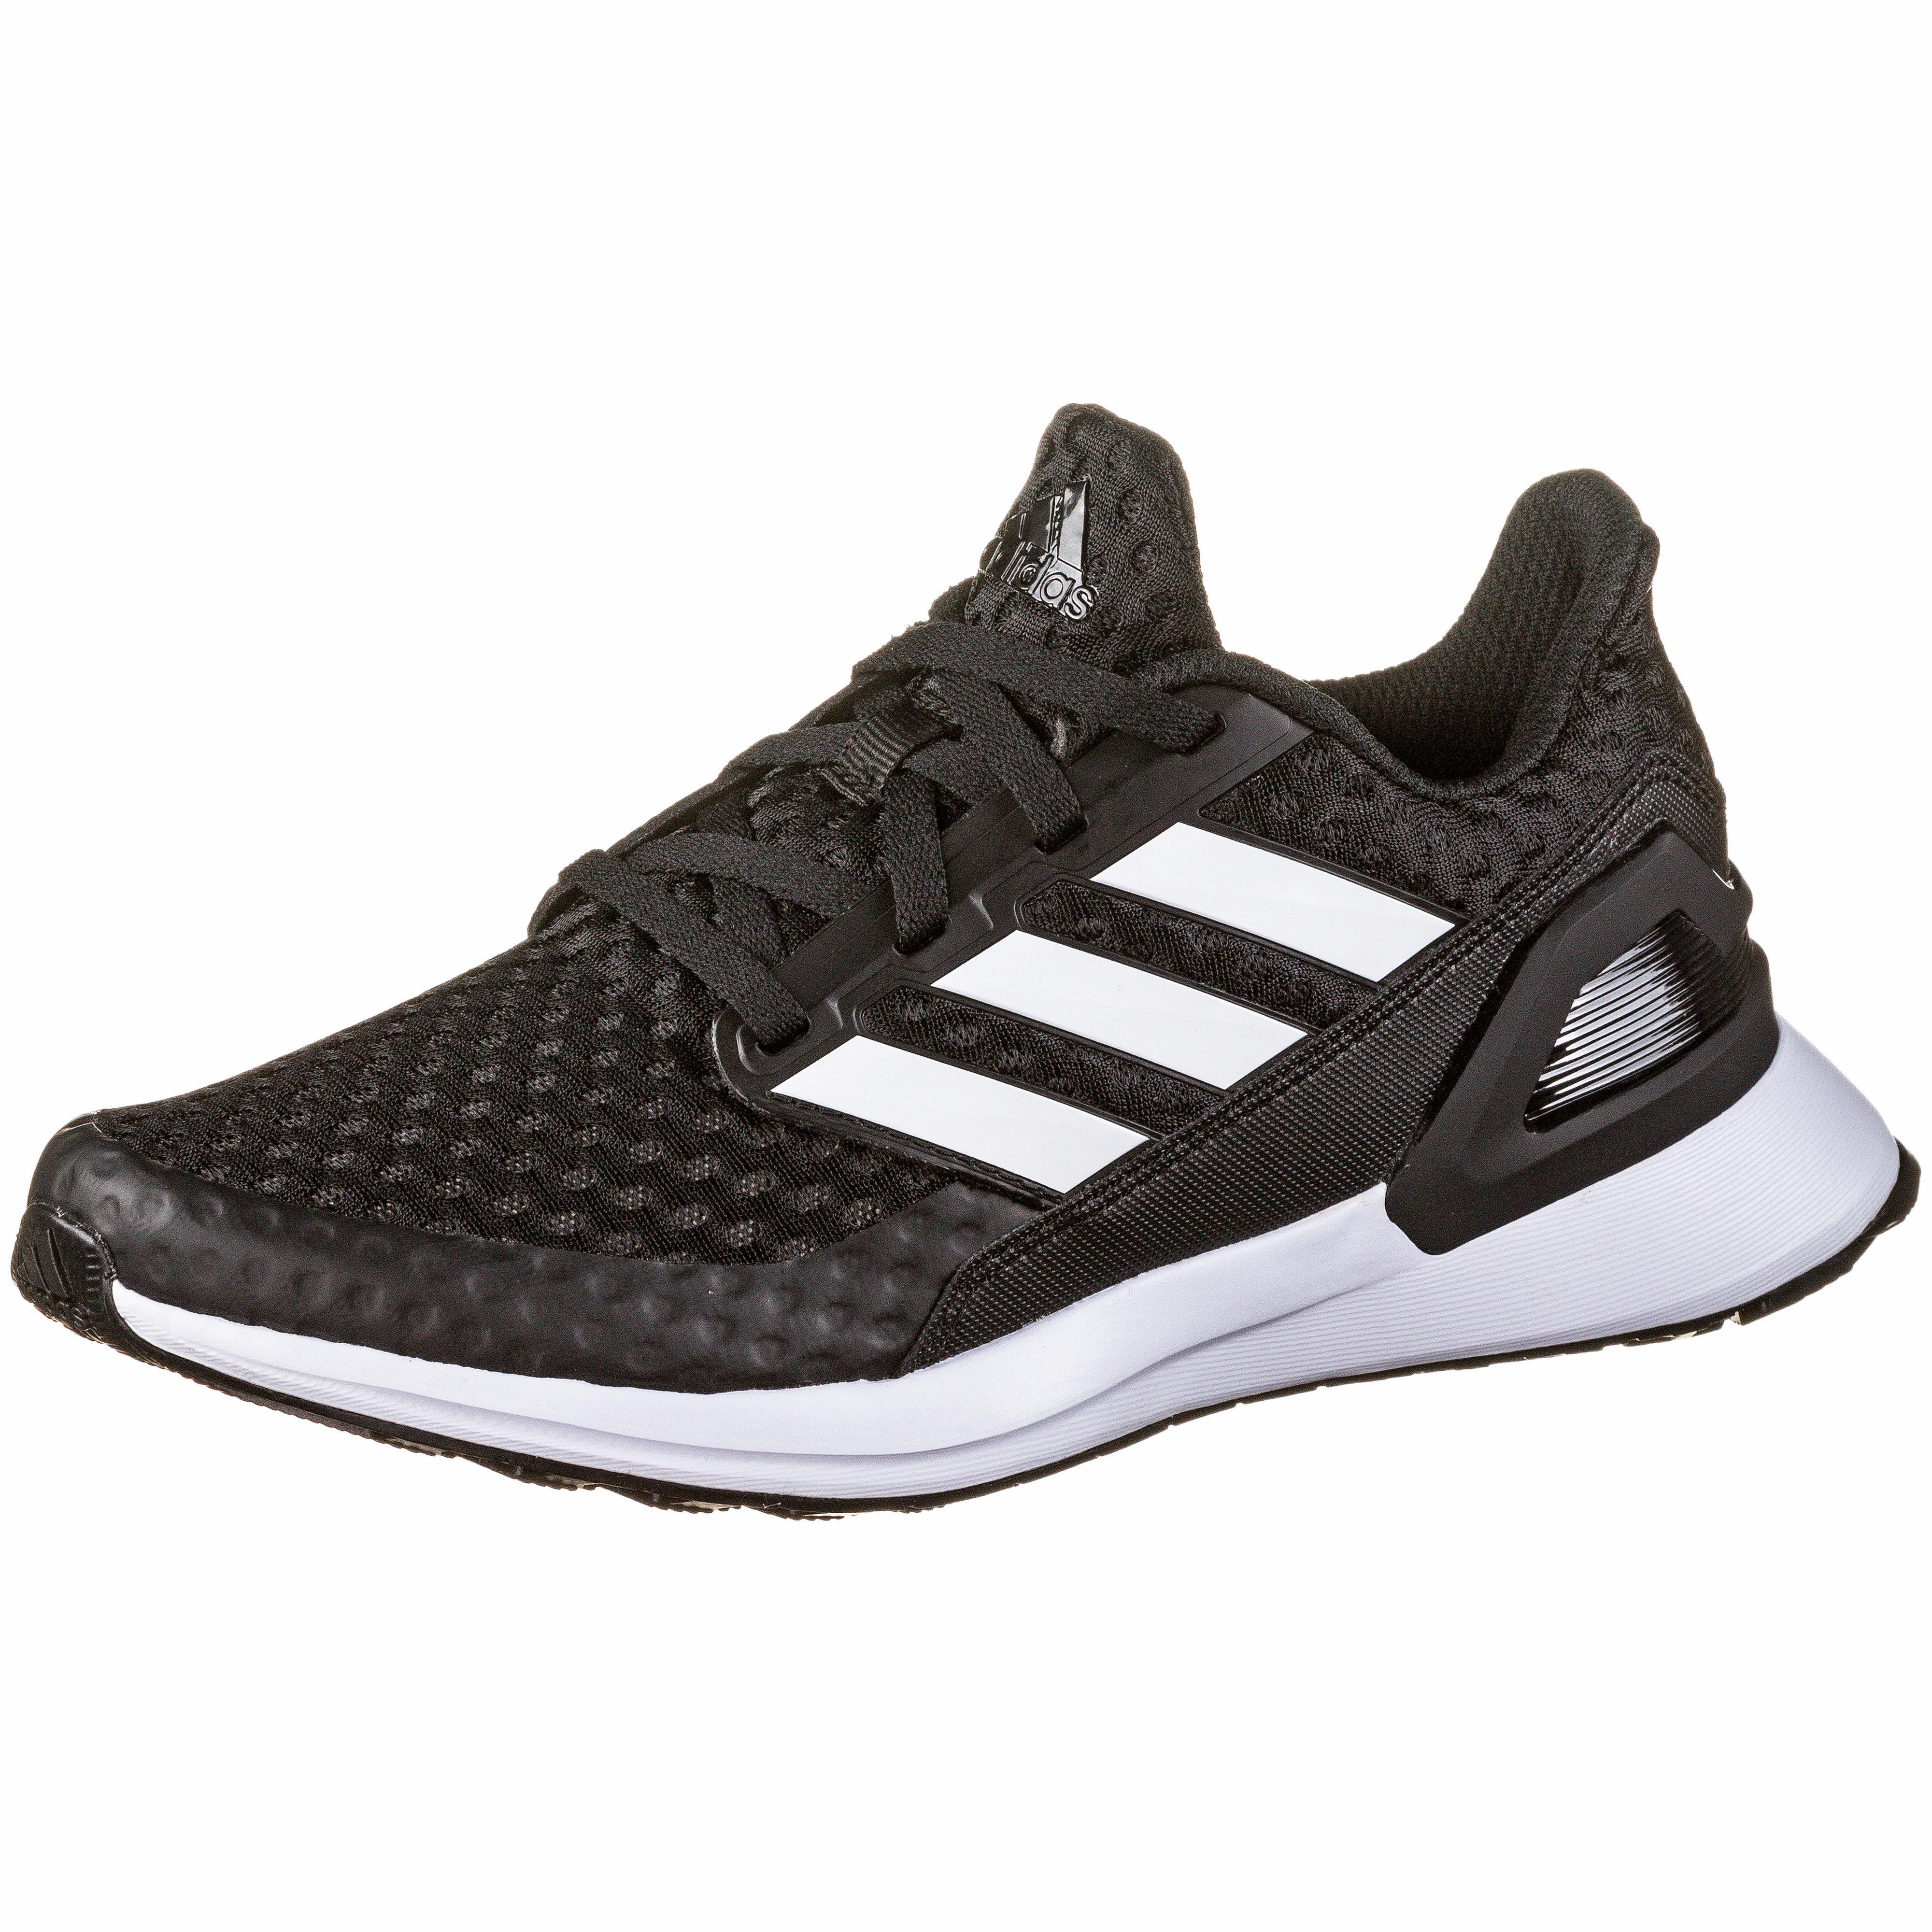 Großhandel adidas NMD R1 Herren Sneakers günstig kaufen